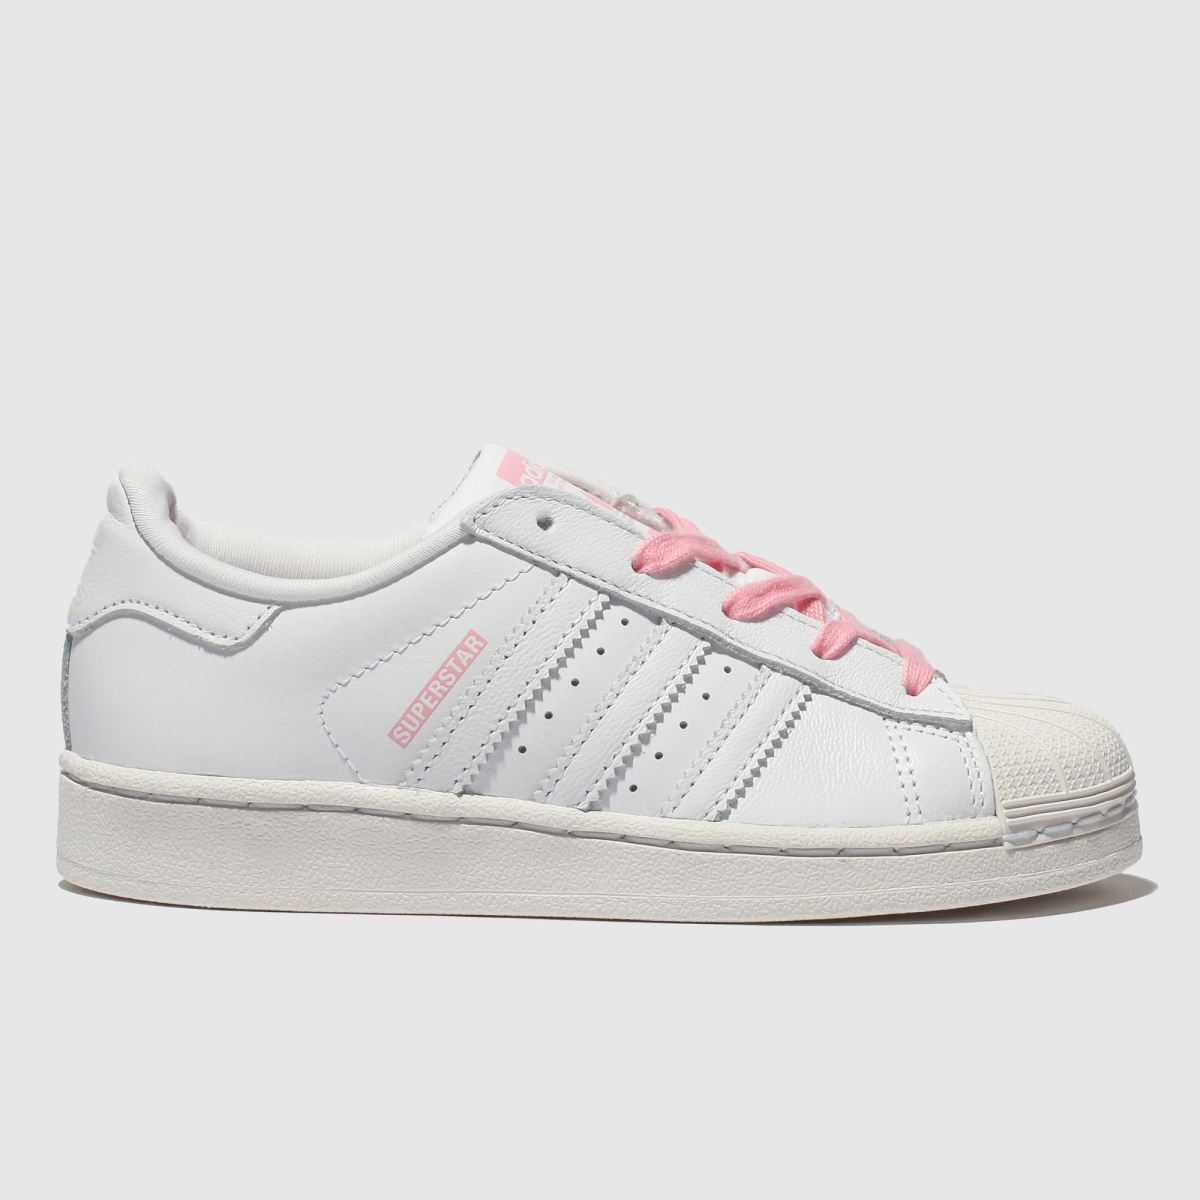 Adidas White & Pink Superstar Trainers Junior